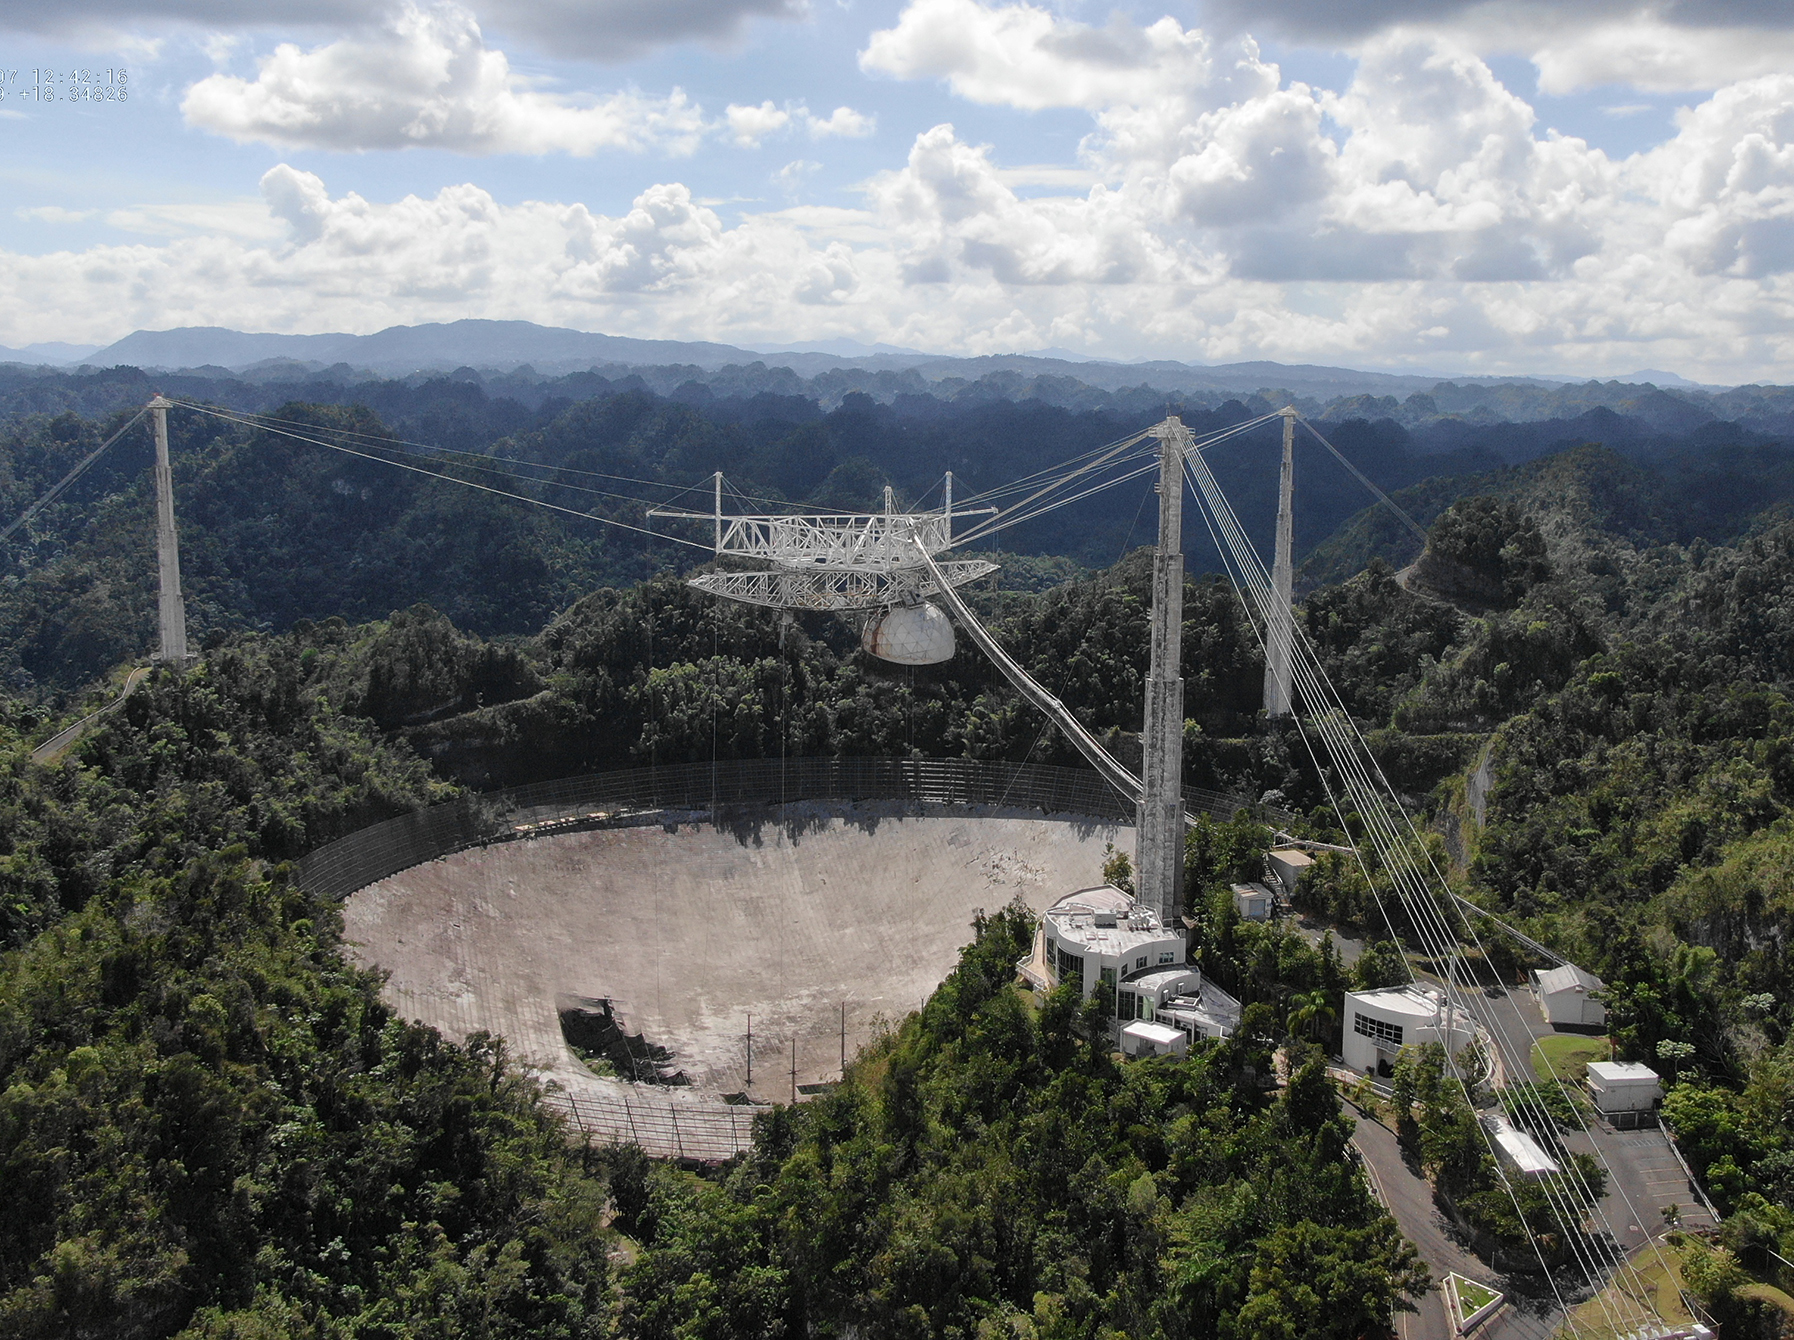 The damaged Arecibo Telescope